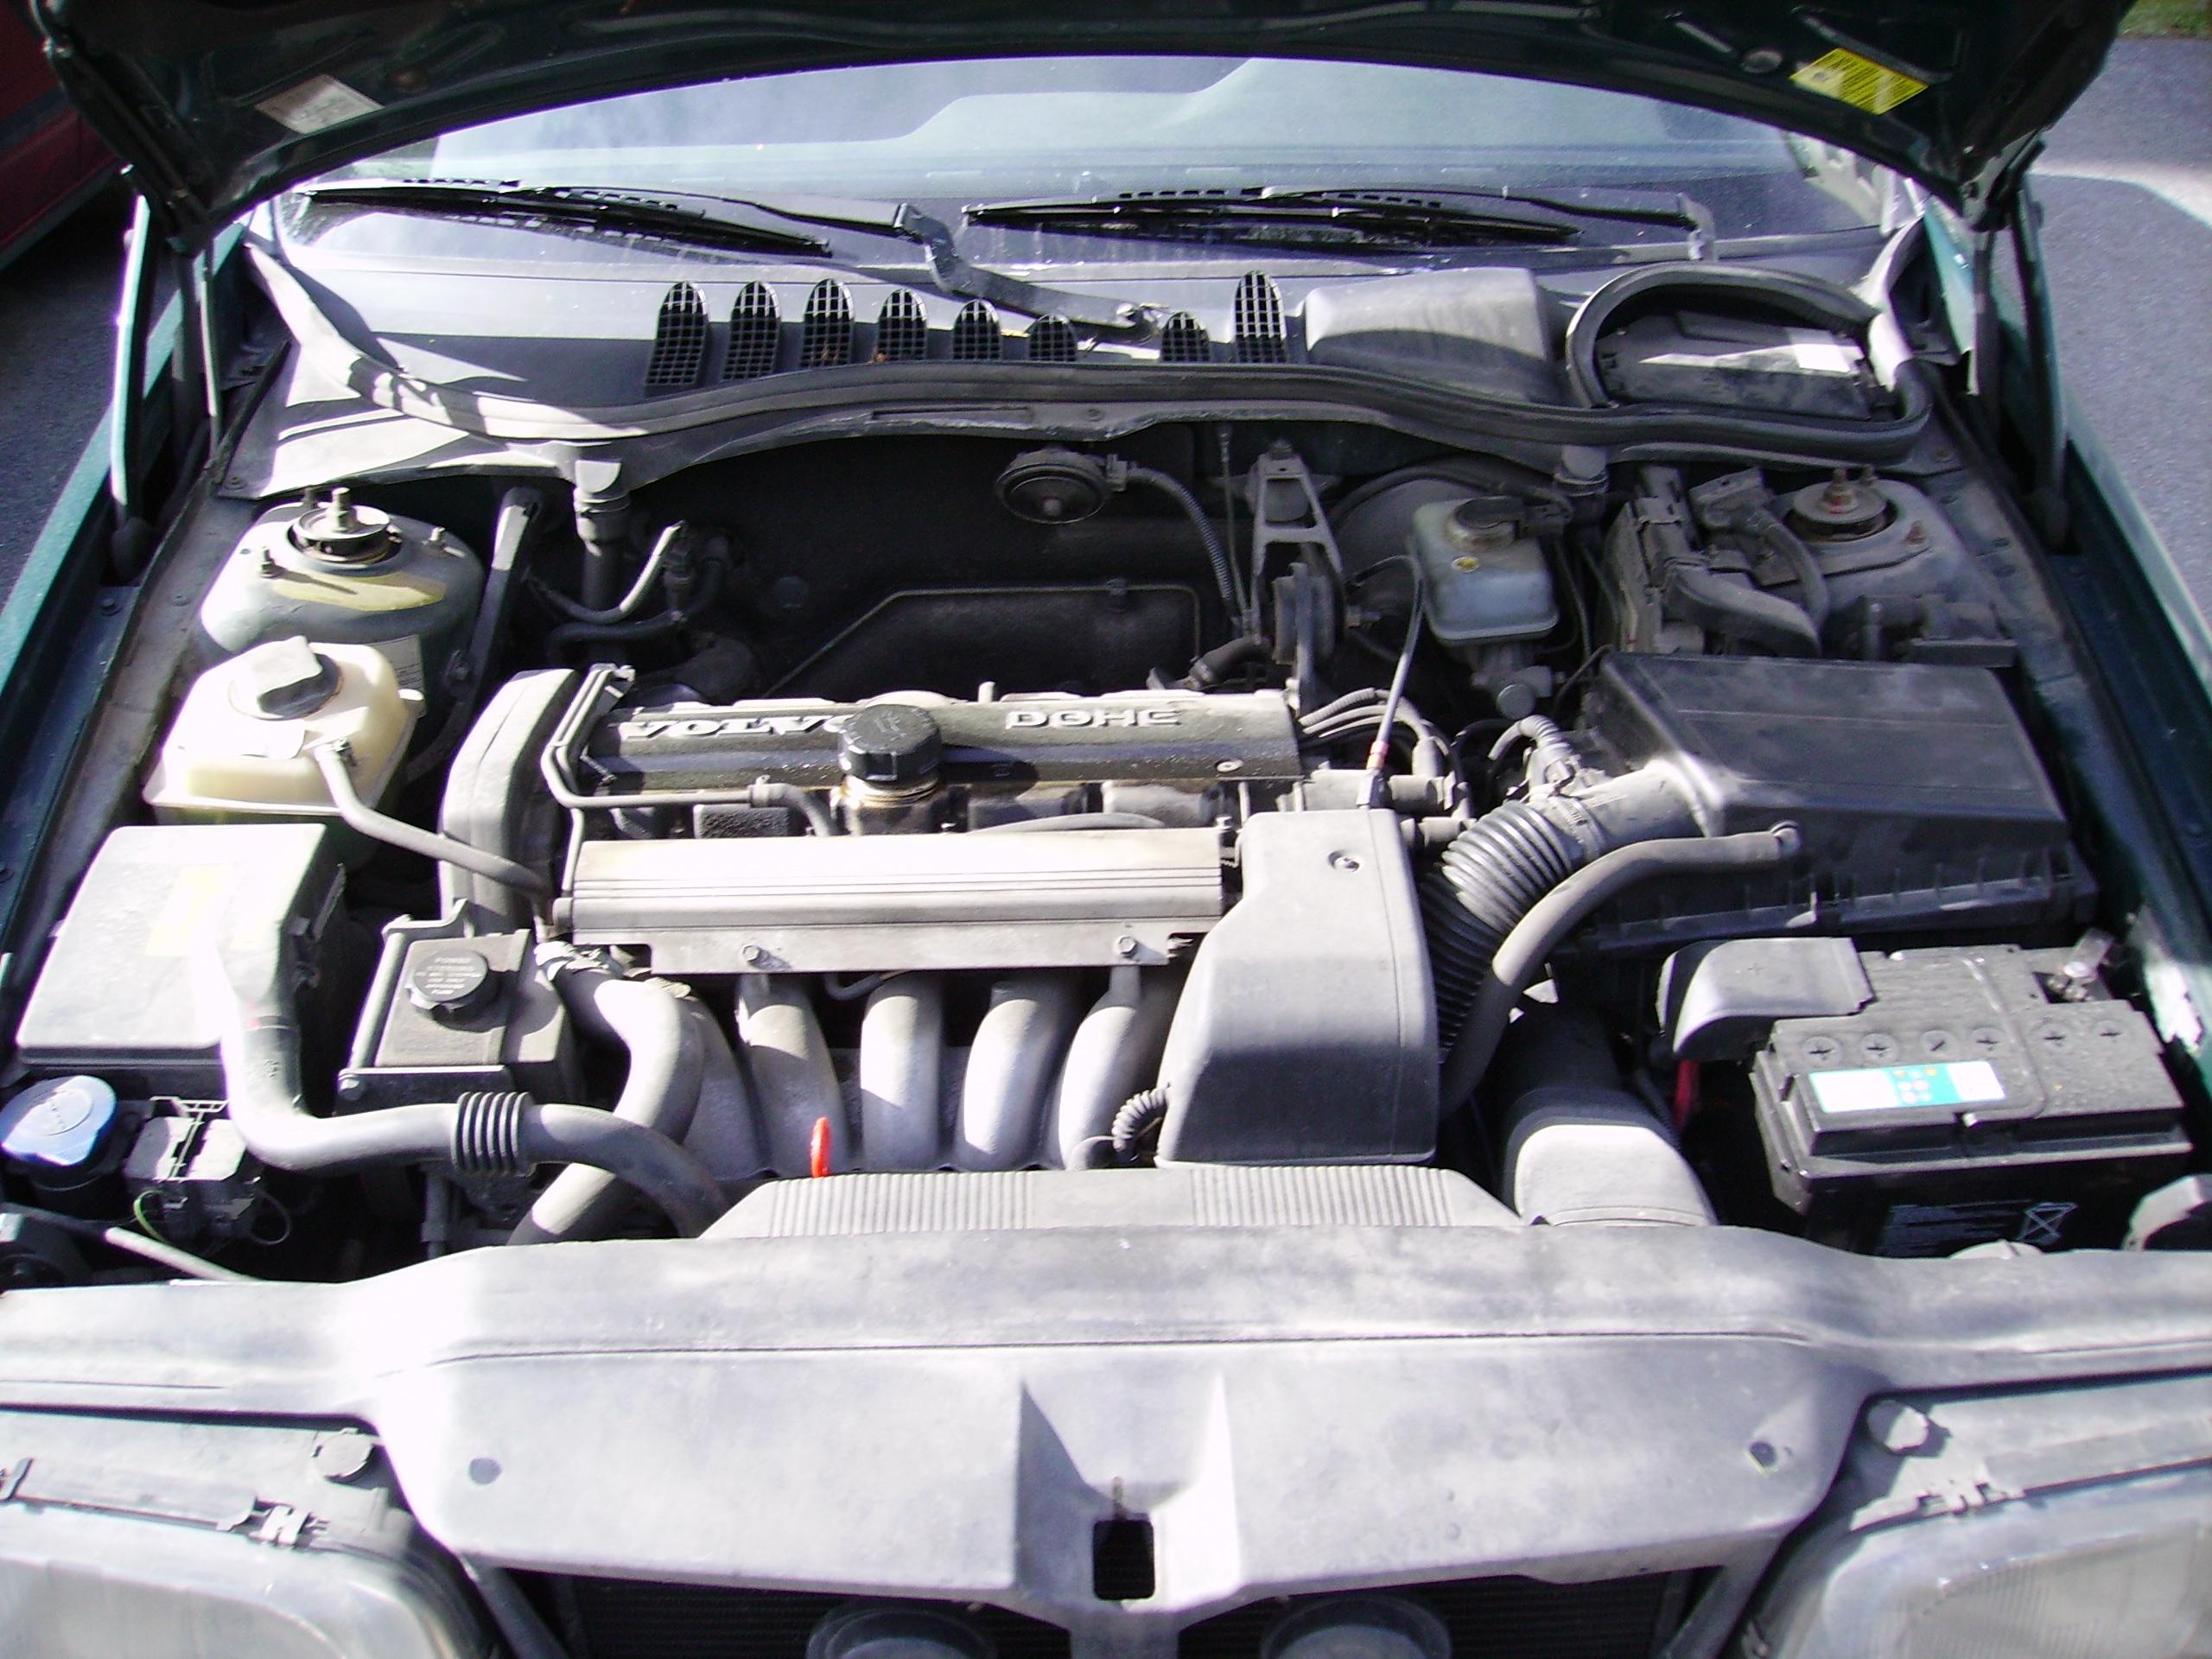 price modifications pictures turbo engine volvo moibibiki